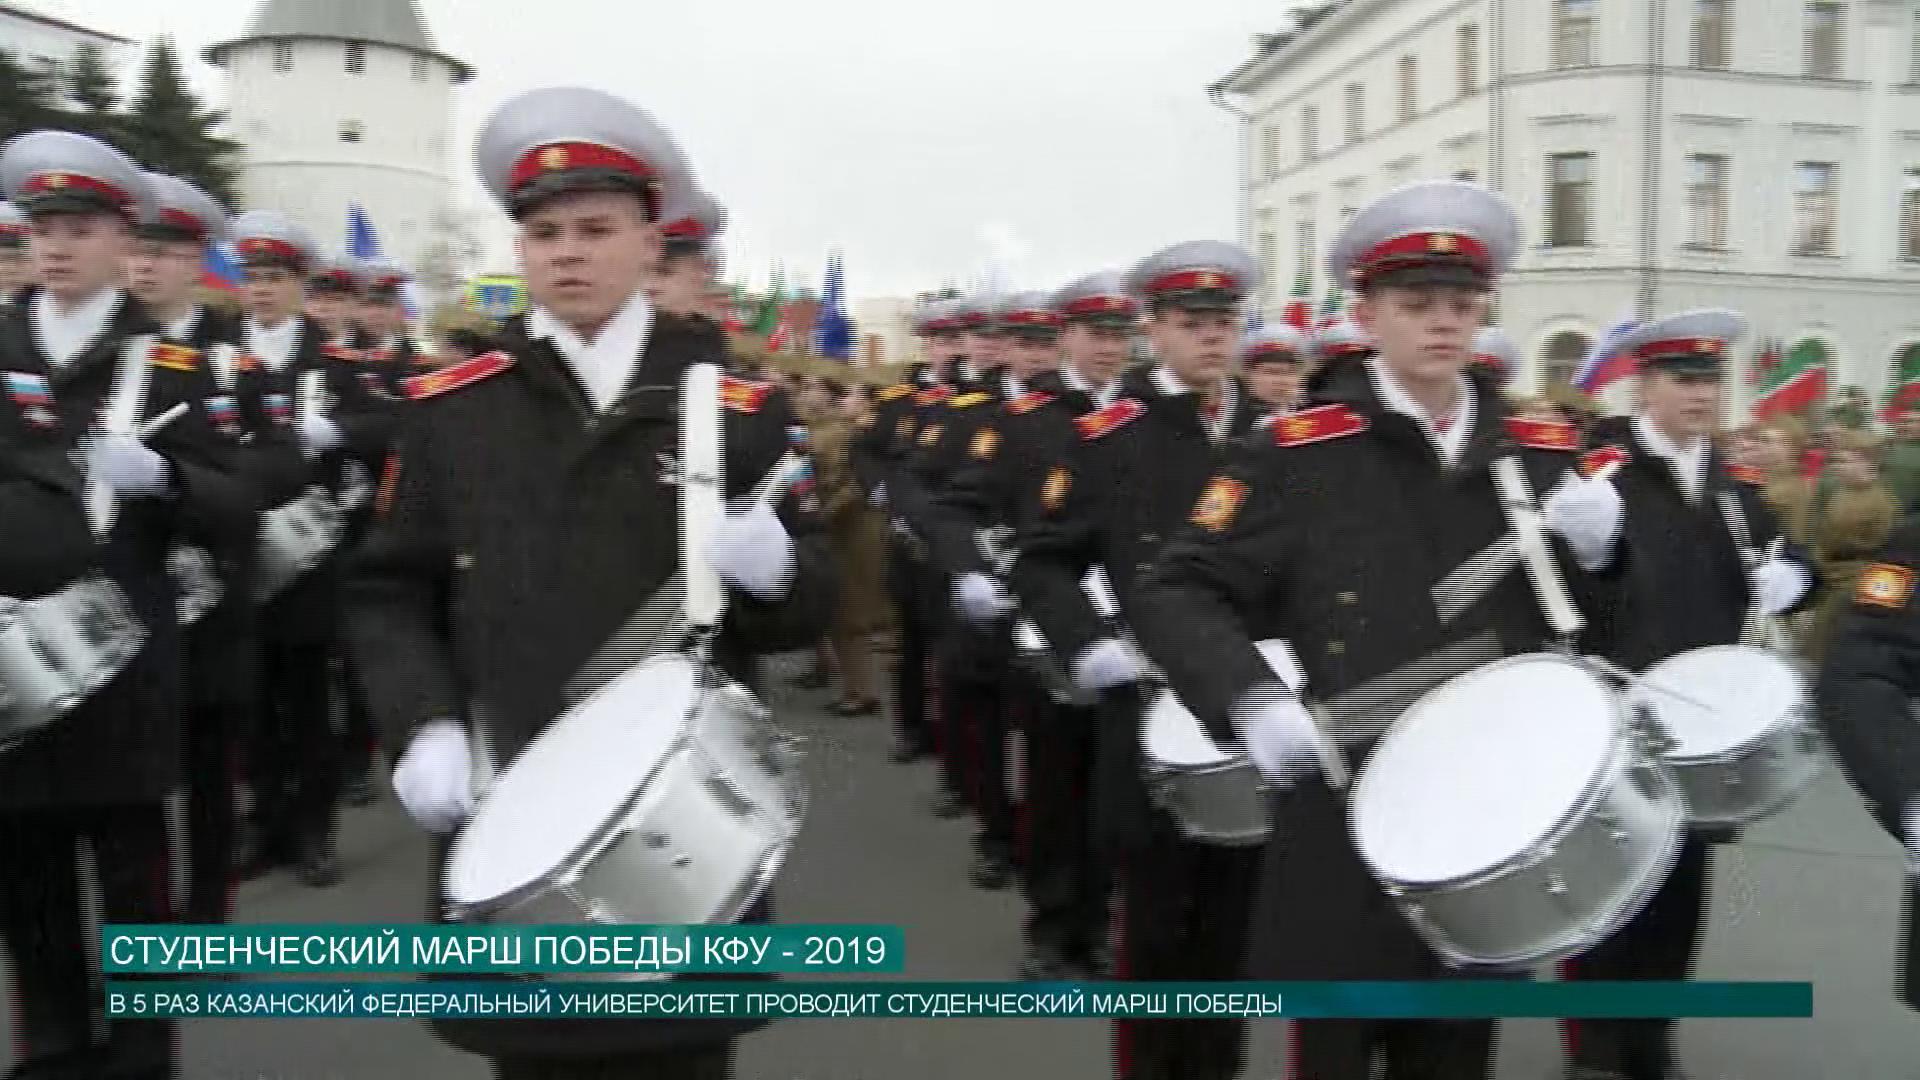 Студенческий марш победы КФУ - 2019